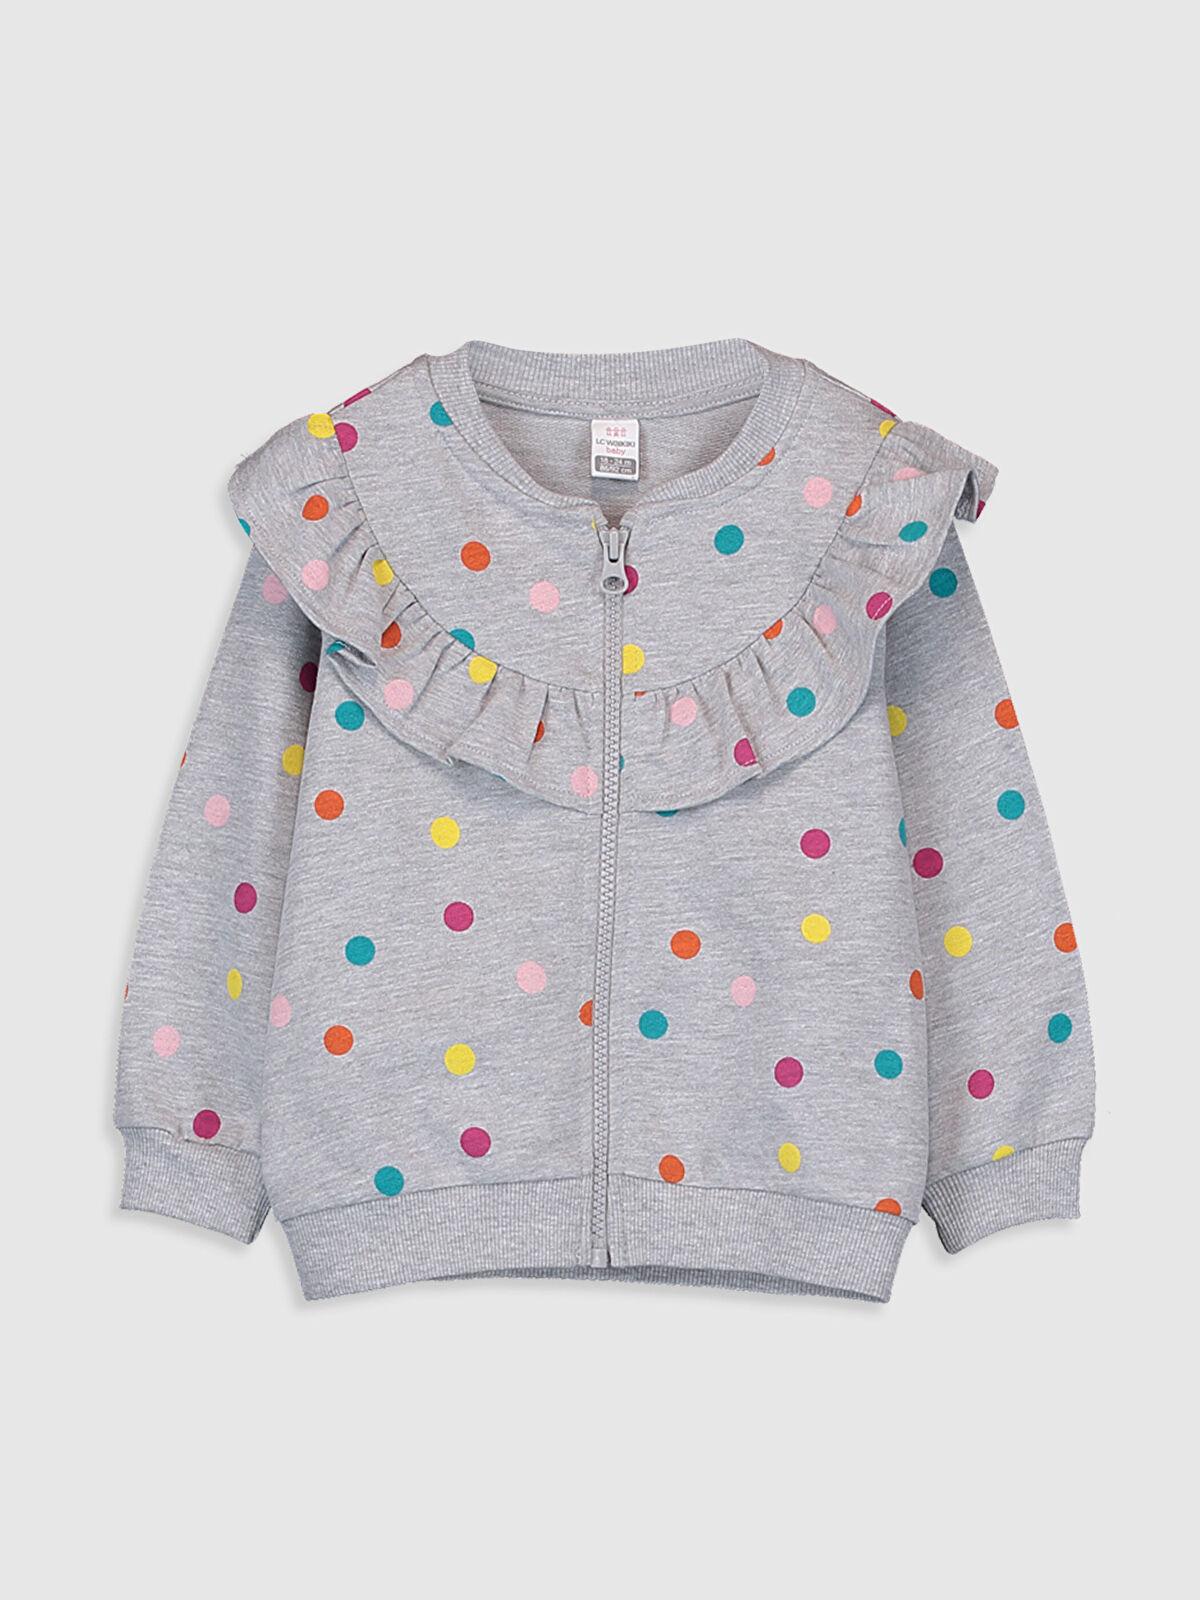 Kız Bebek Puantiyeli Sweatshirt - LC WAIKIKI